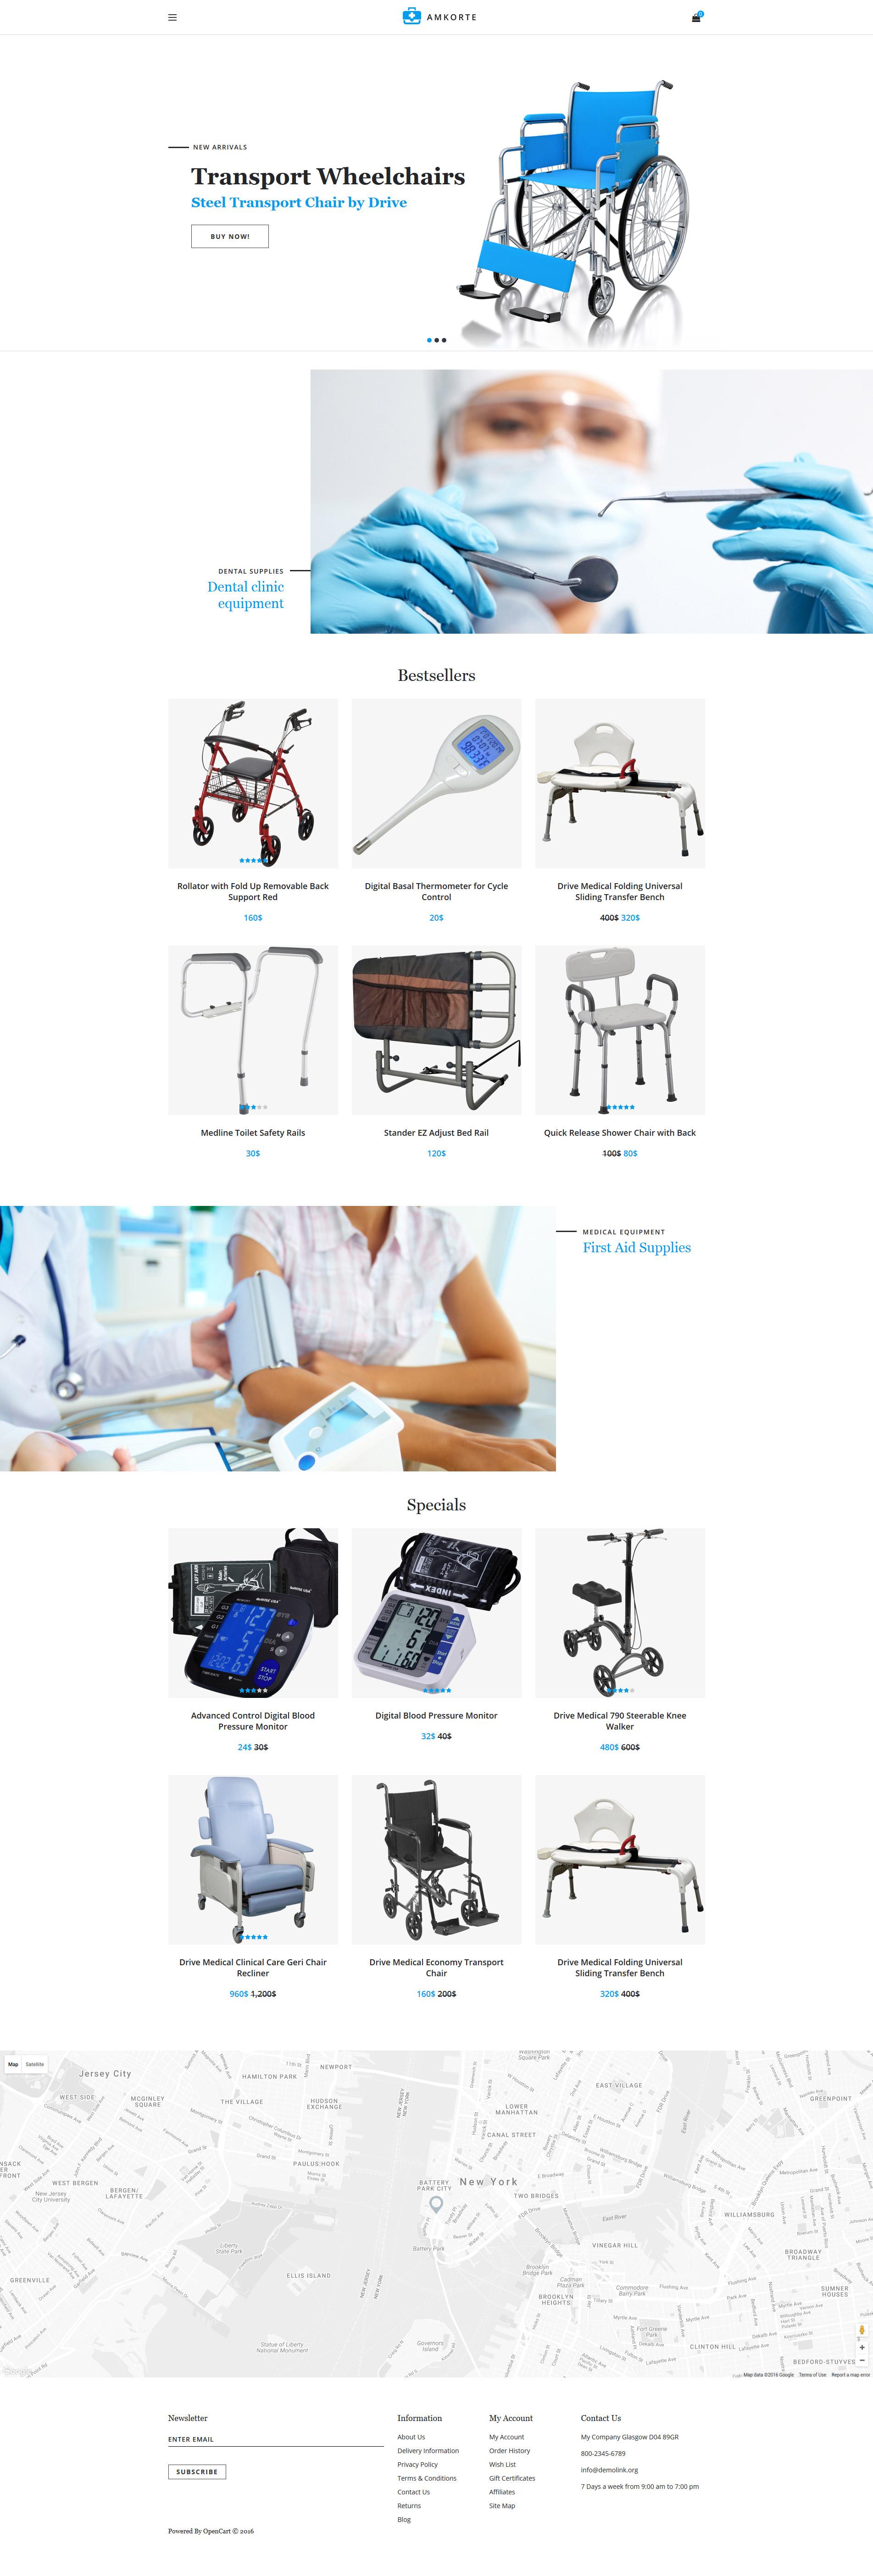 Responsywny szablon OpenCart Amkorte - Medical Equipment Store #61383 - zrzut ekranu